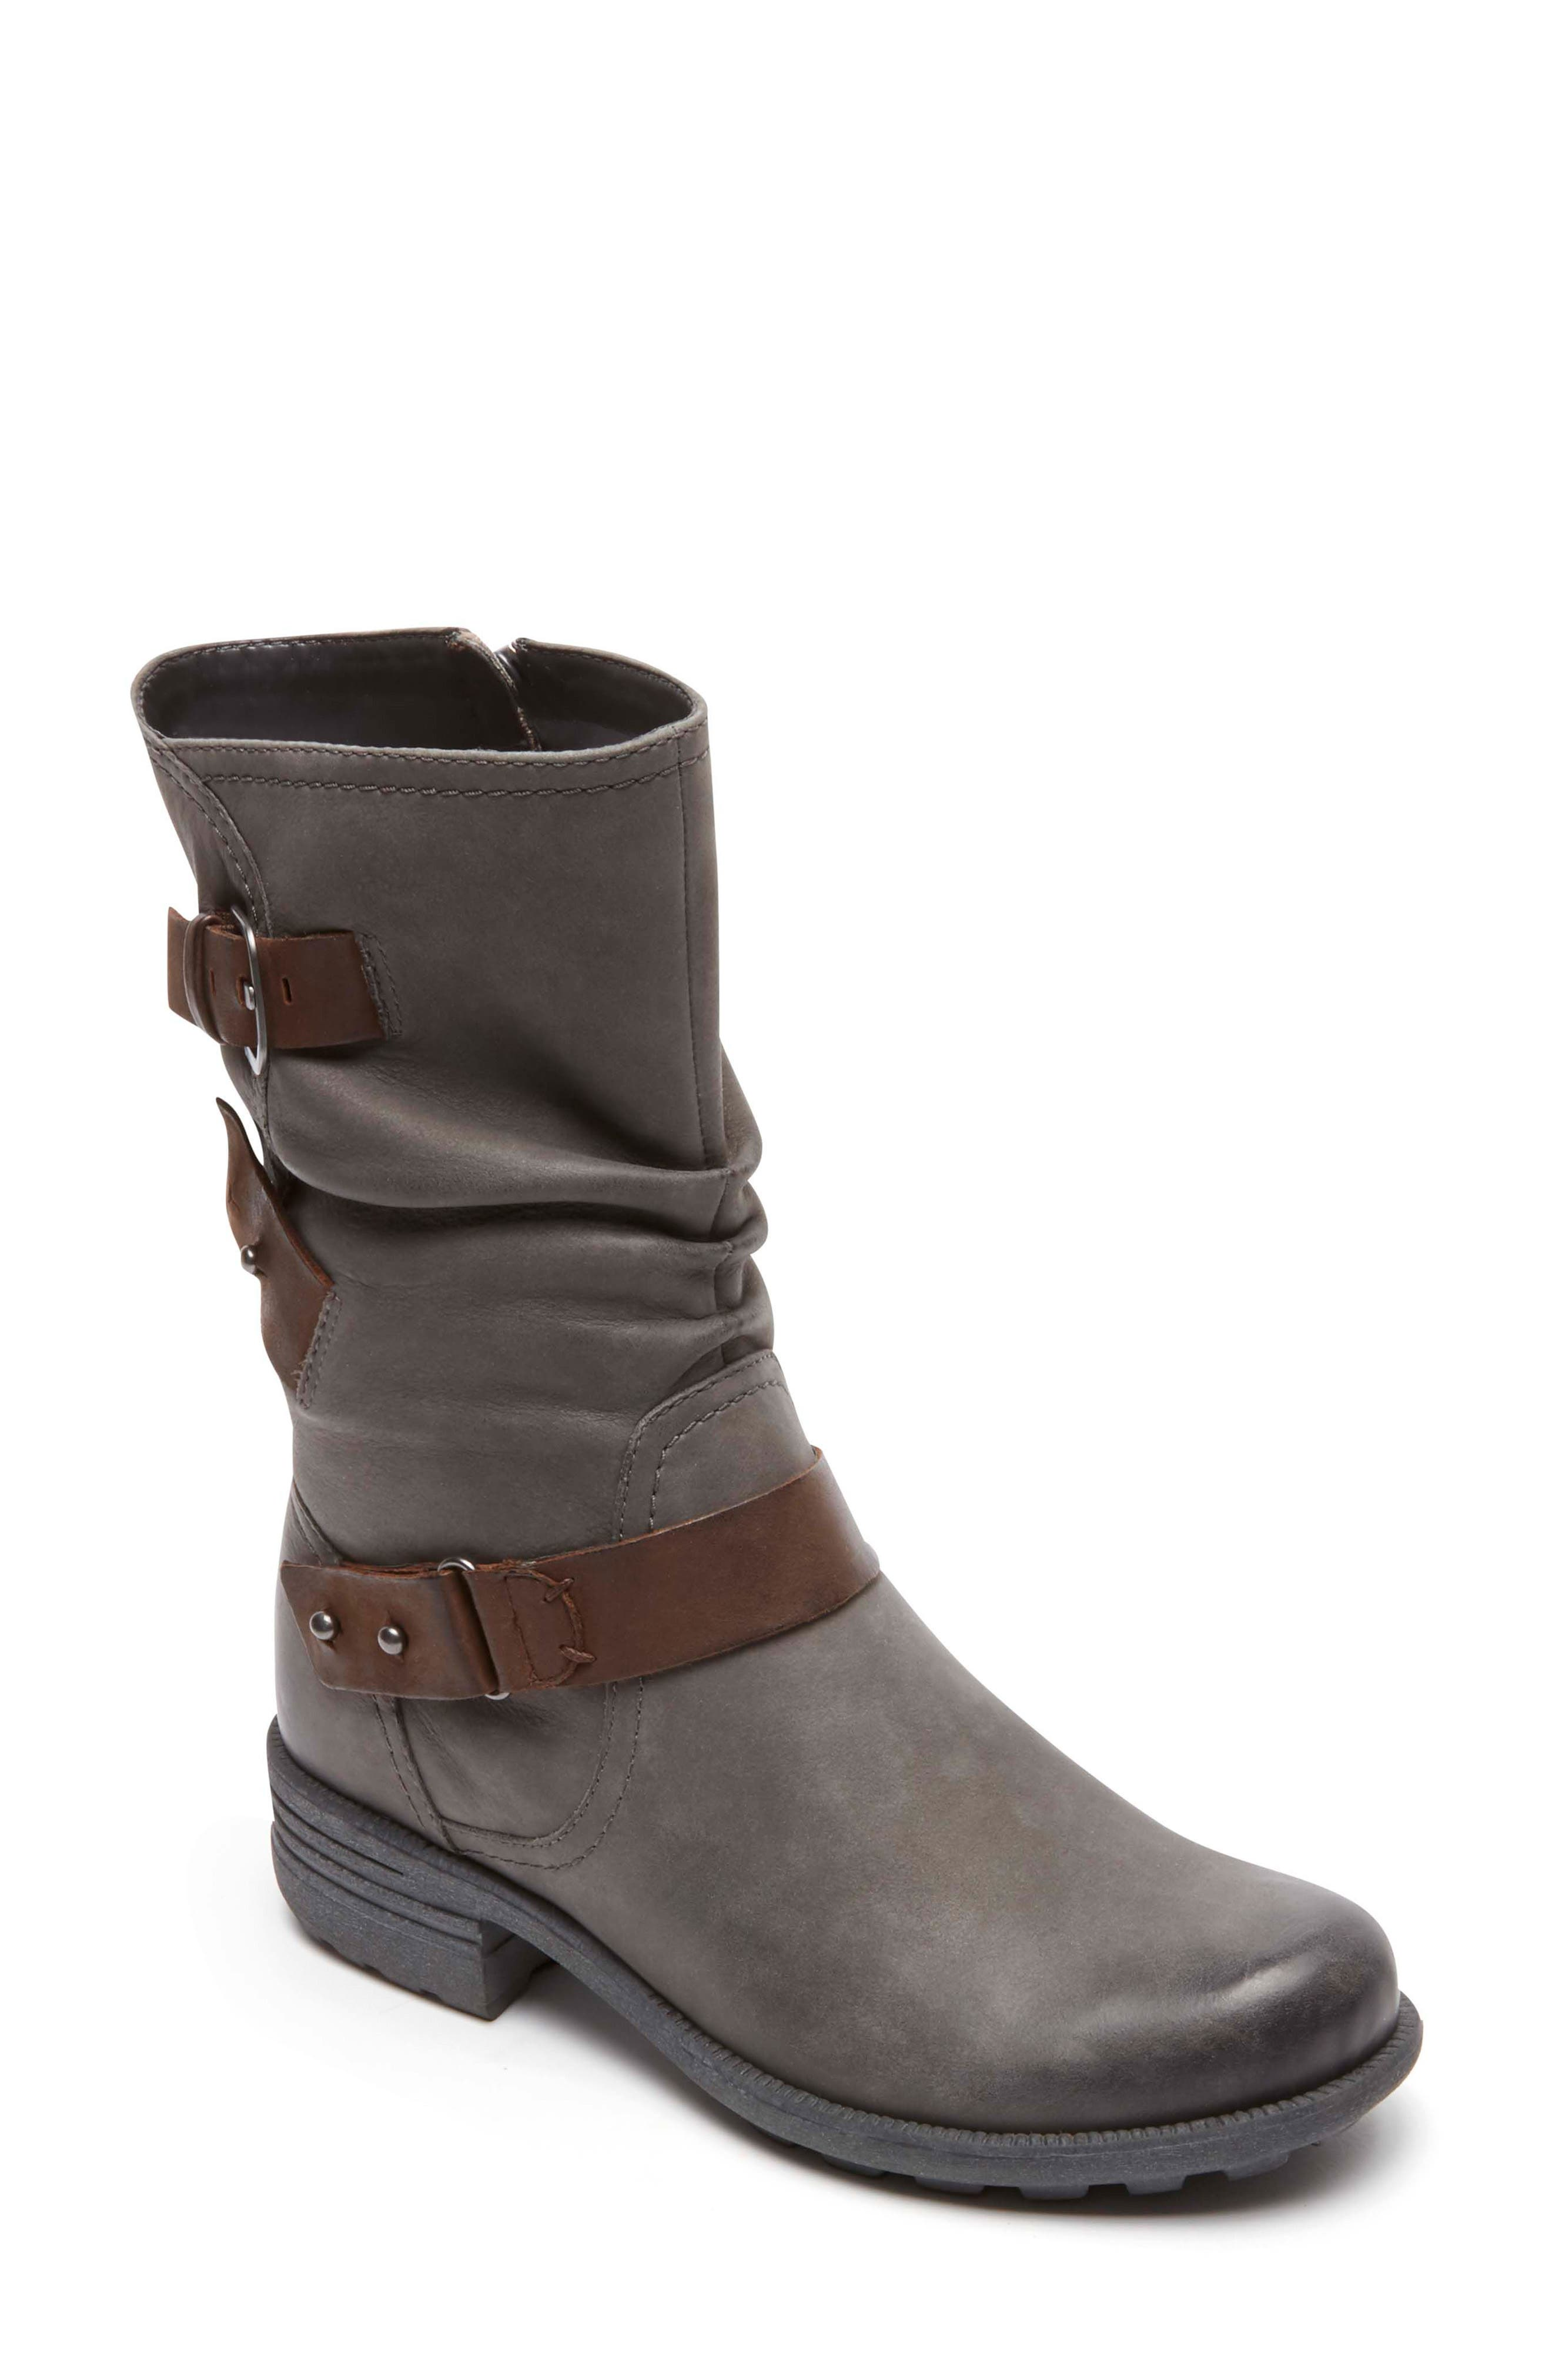 67bd96cd4c9a8 Women's Rockport Cobb Hill Boots | Nordstrom